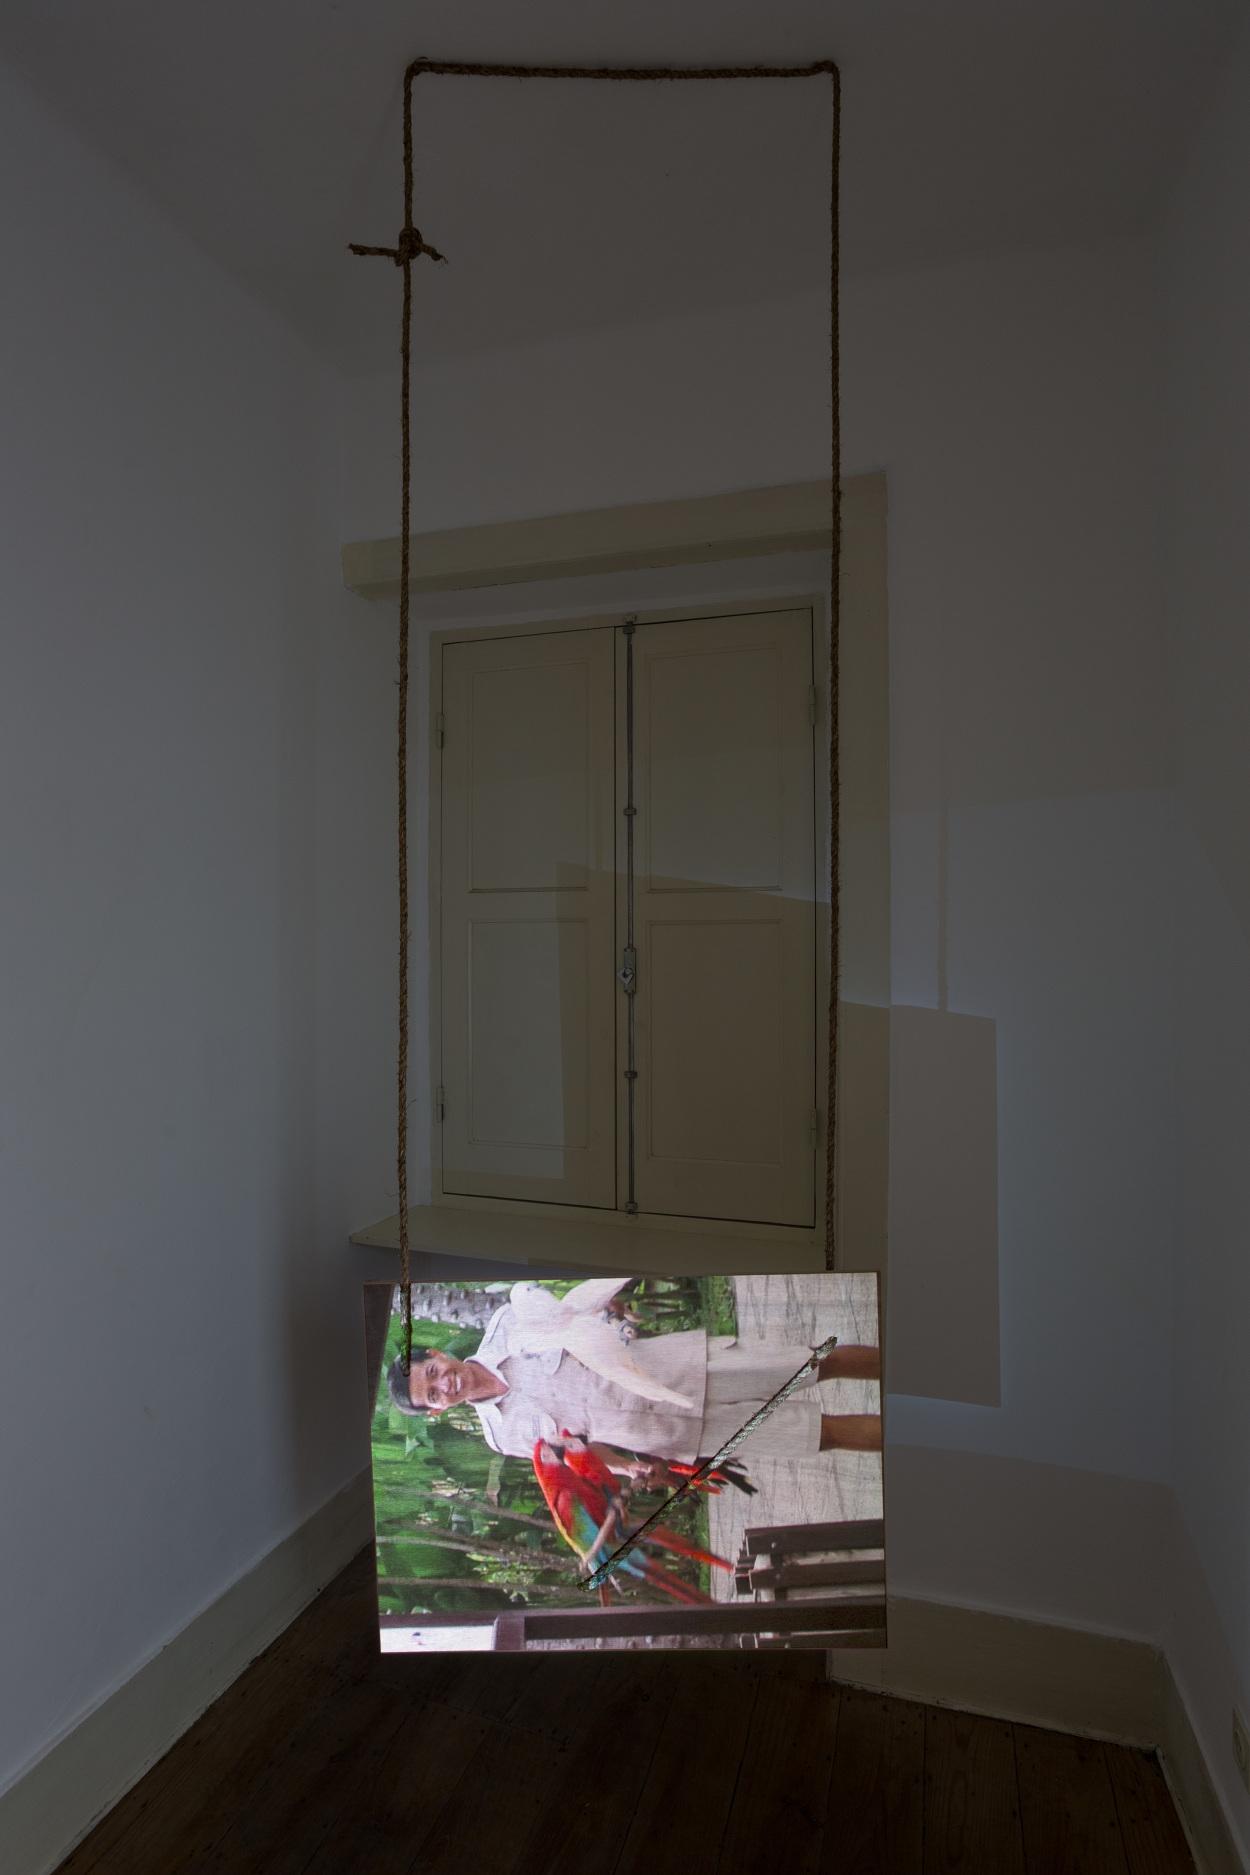 525ec5e7efbf2 Alexandre Estrela The Bird s Leg 2018 video projection on prepared wooden  screen